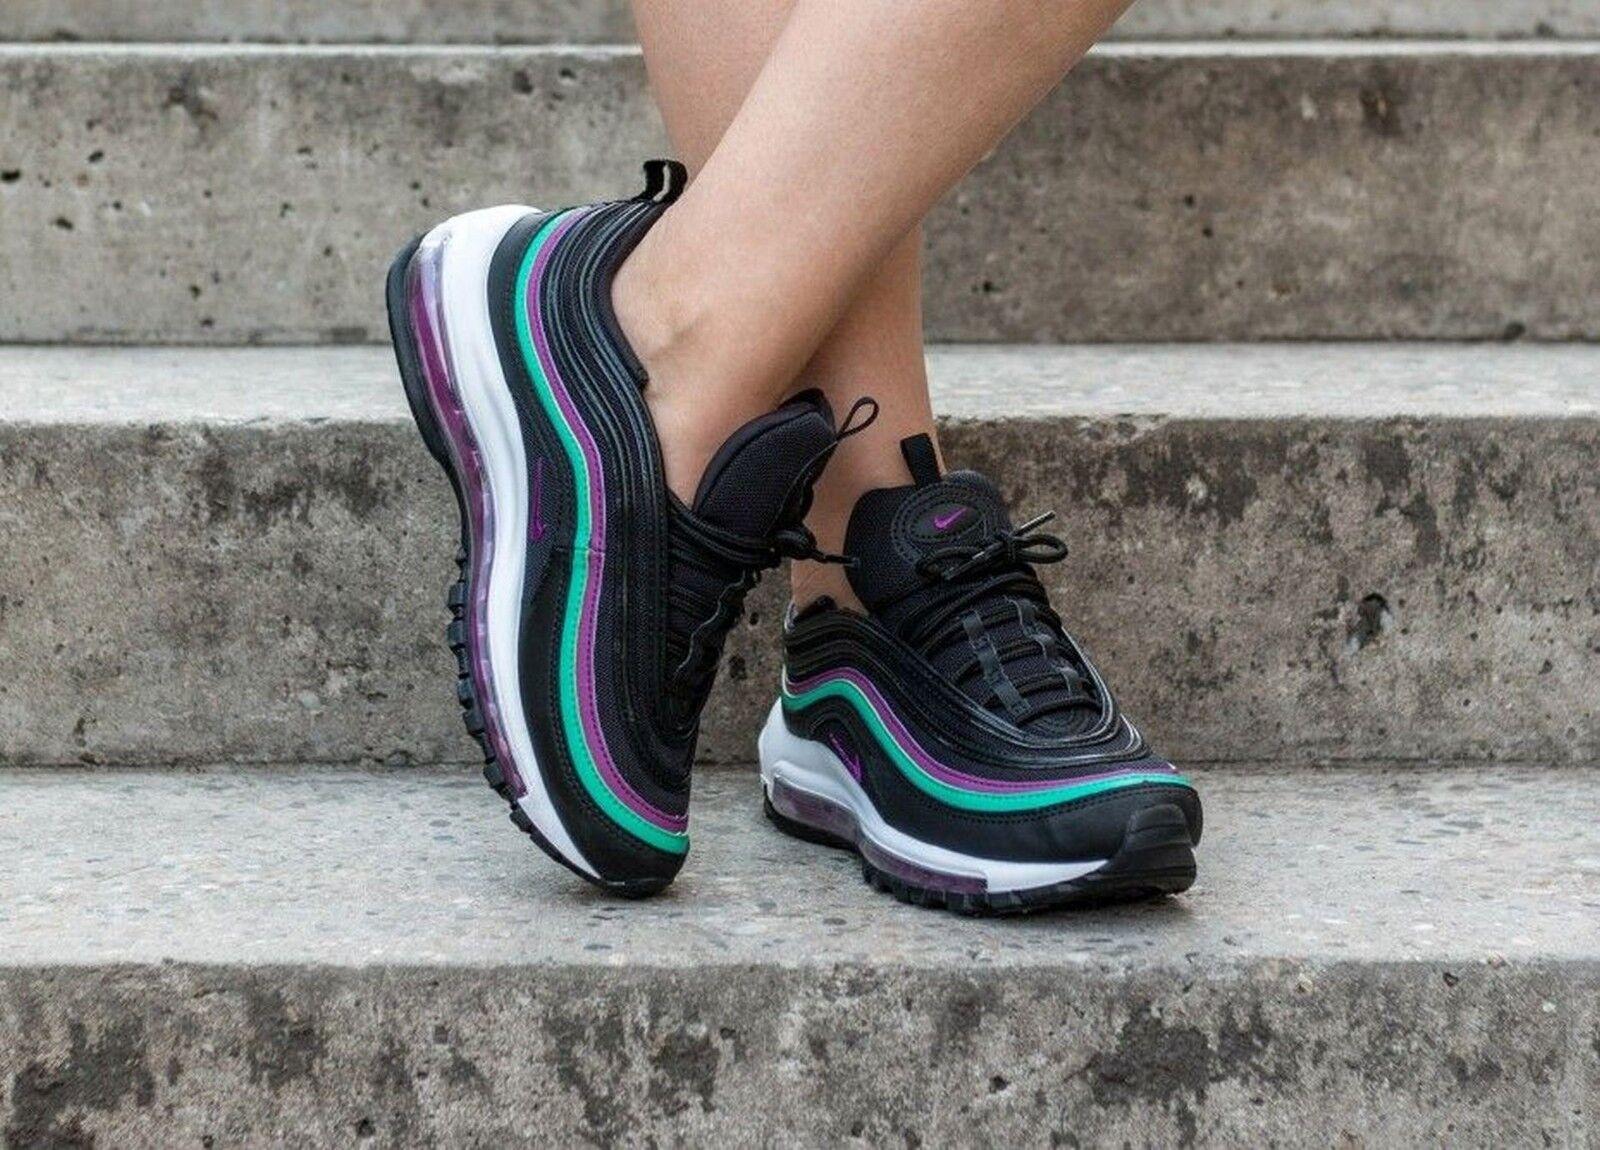 c2128f3475 Nike Air Max 97 Grape Womens 921733-008 Black Emerald Running Shoes ...